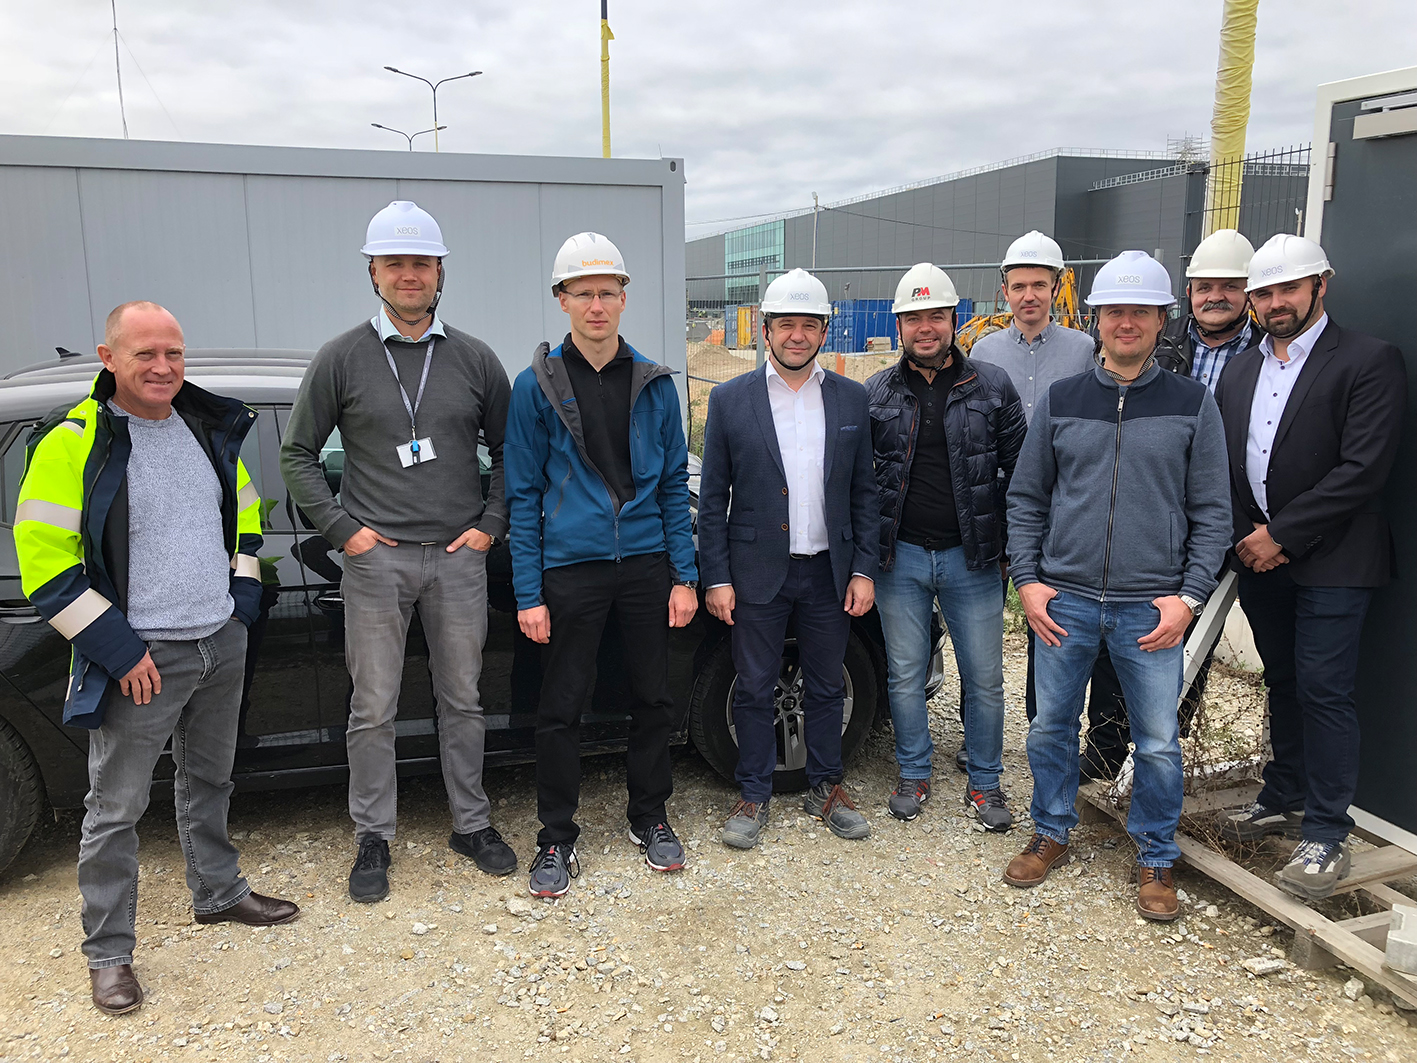 Foto: Keßler Solutions vor Ort bei XEOS, Herbst 2018